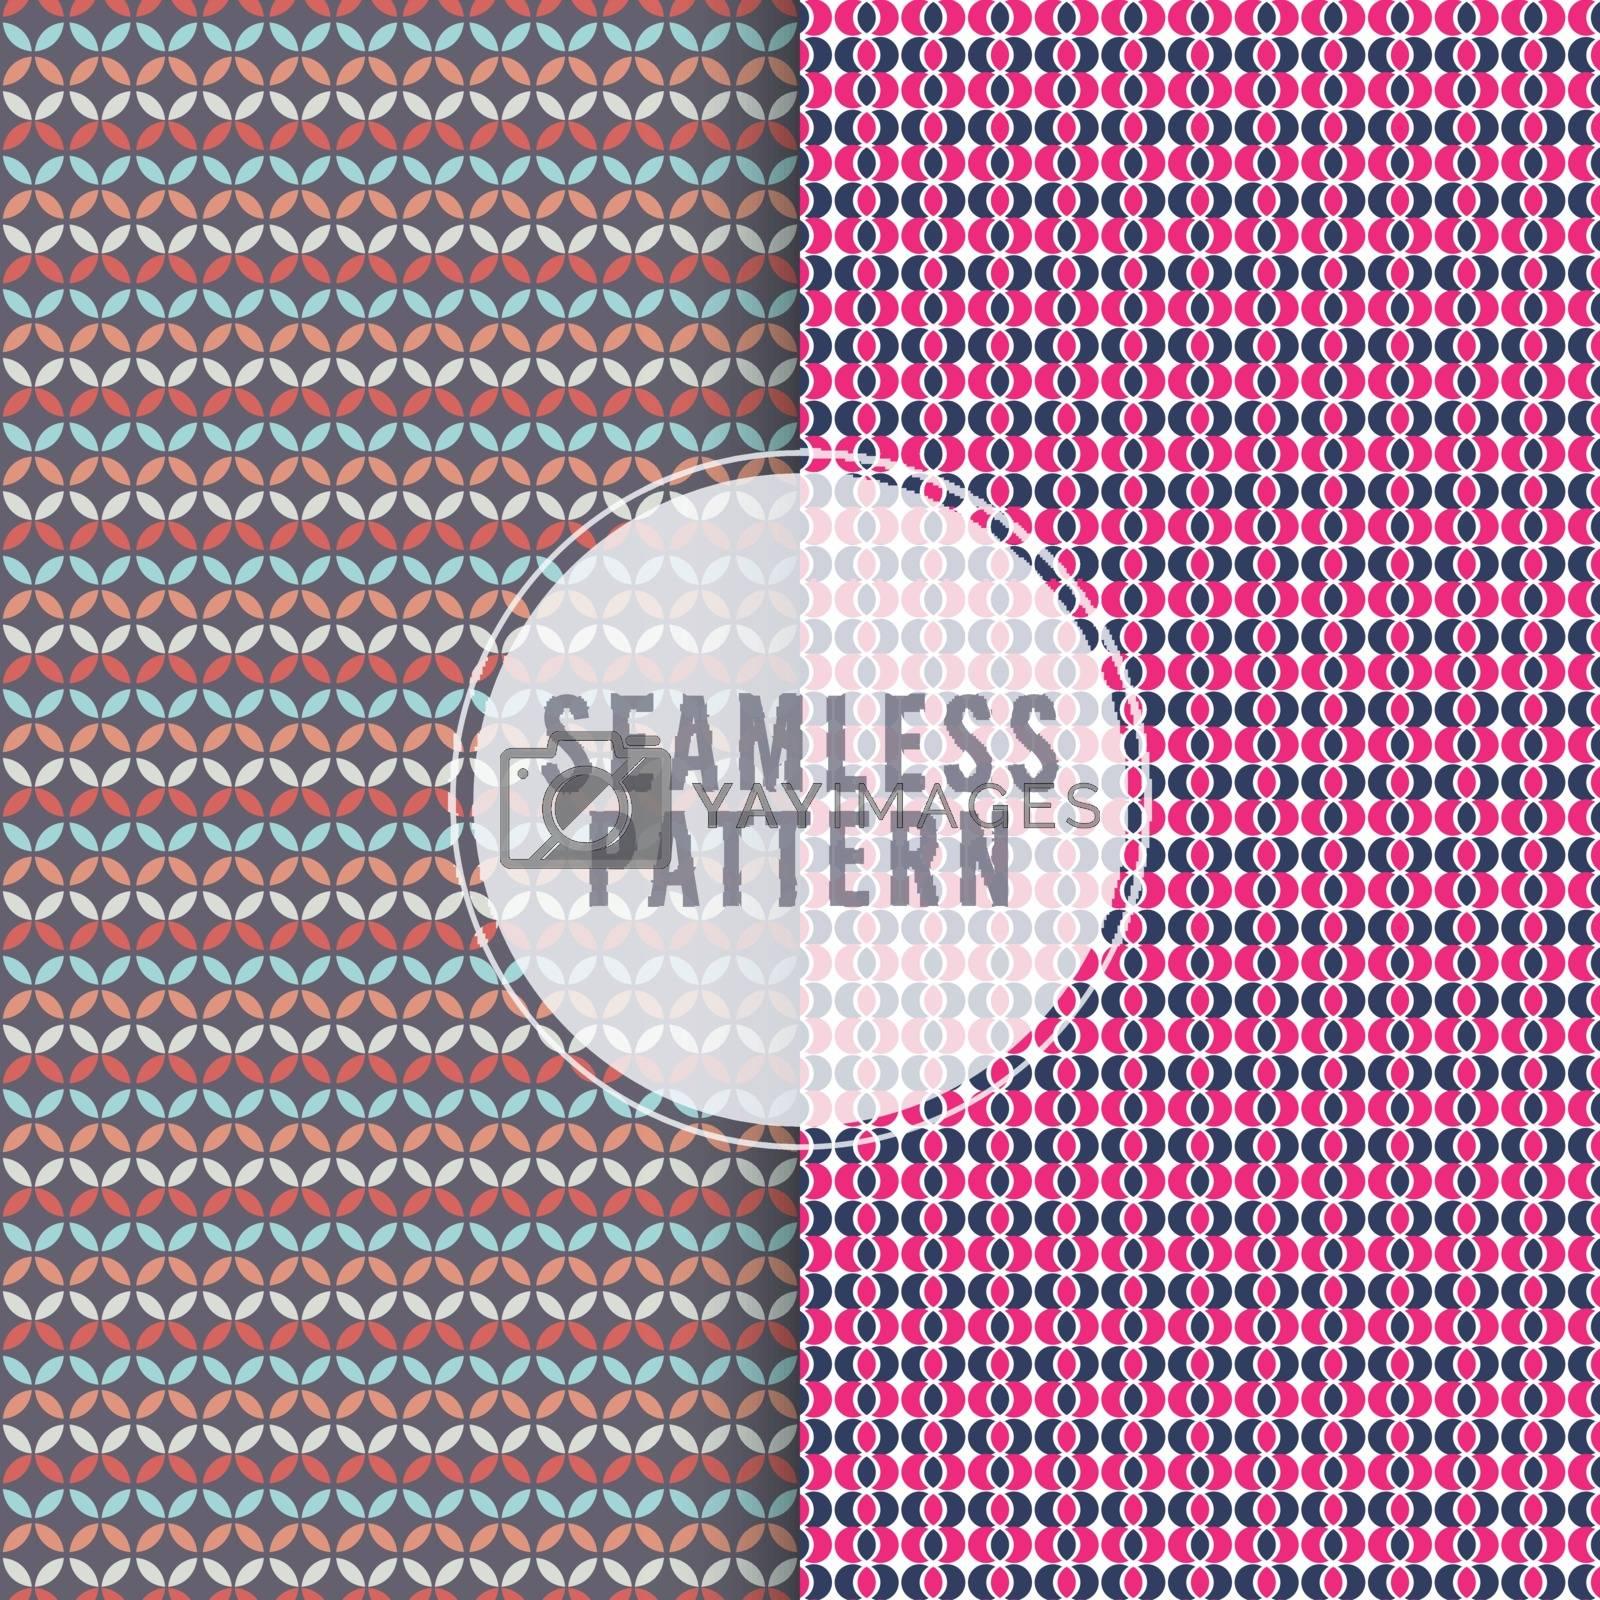 Set of beautiful seamless patterns. by aispl